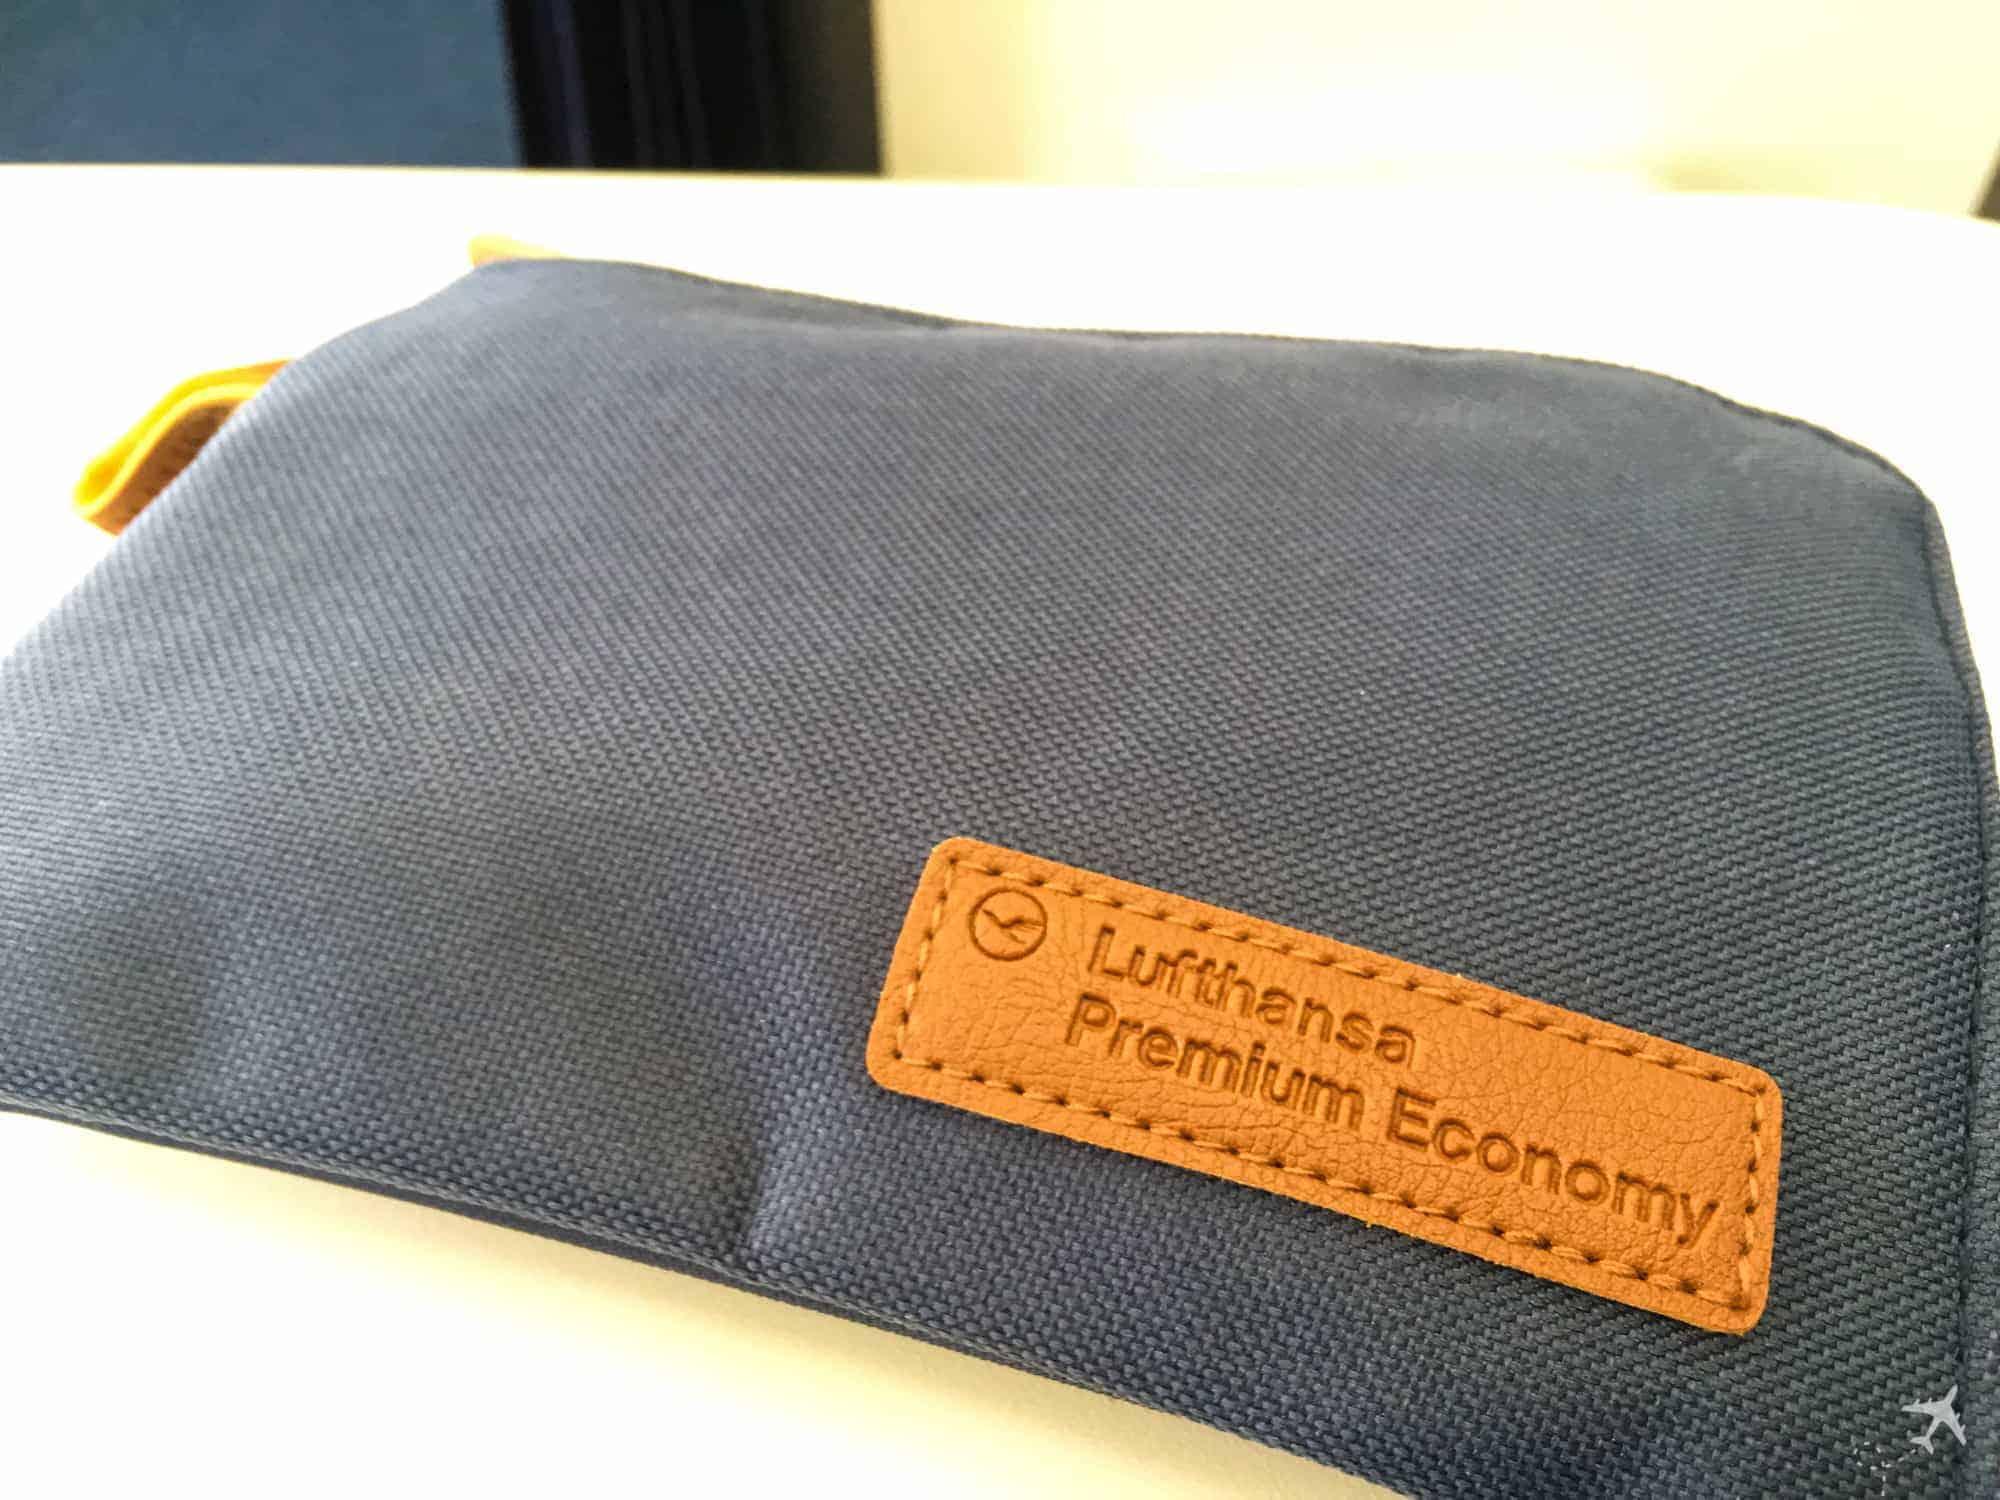 Lufthansa Premium Economy Class Amenity Kit